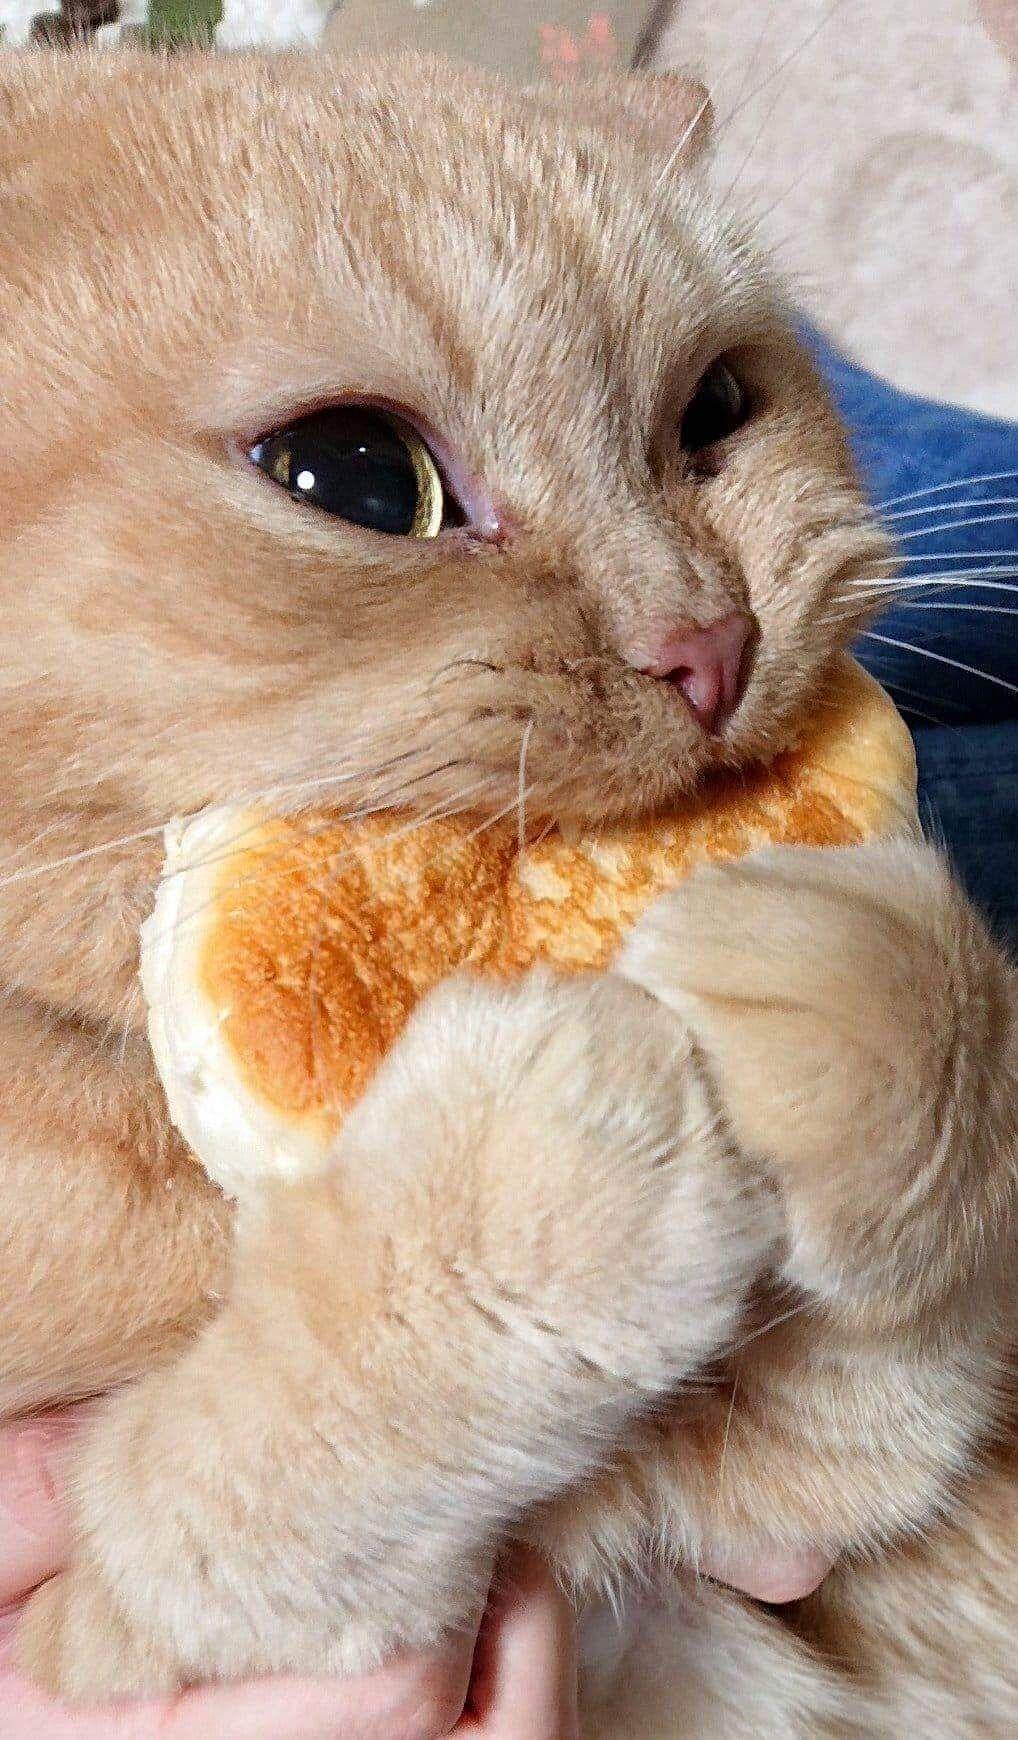 Pin Oleh Noiinoli Di Cat Kucing Cantik Kucing Bayi Anak Kucing